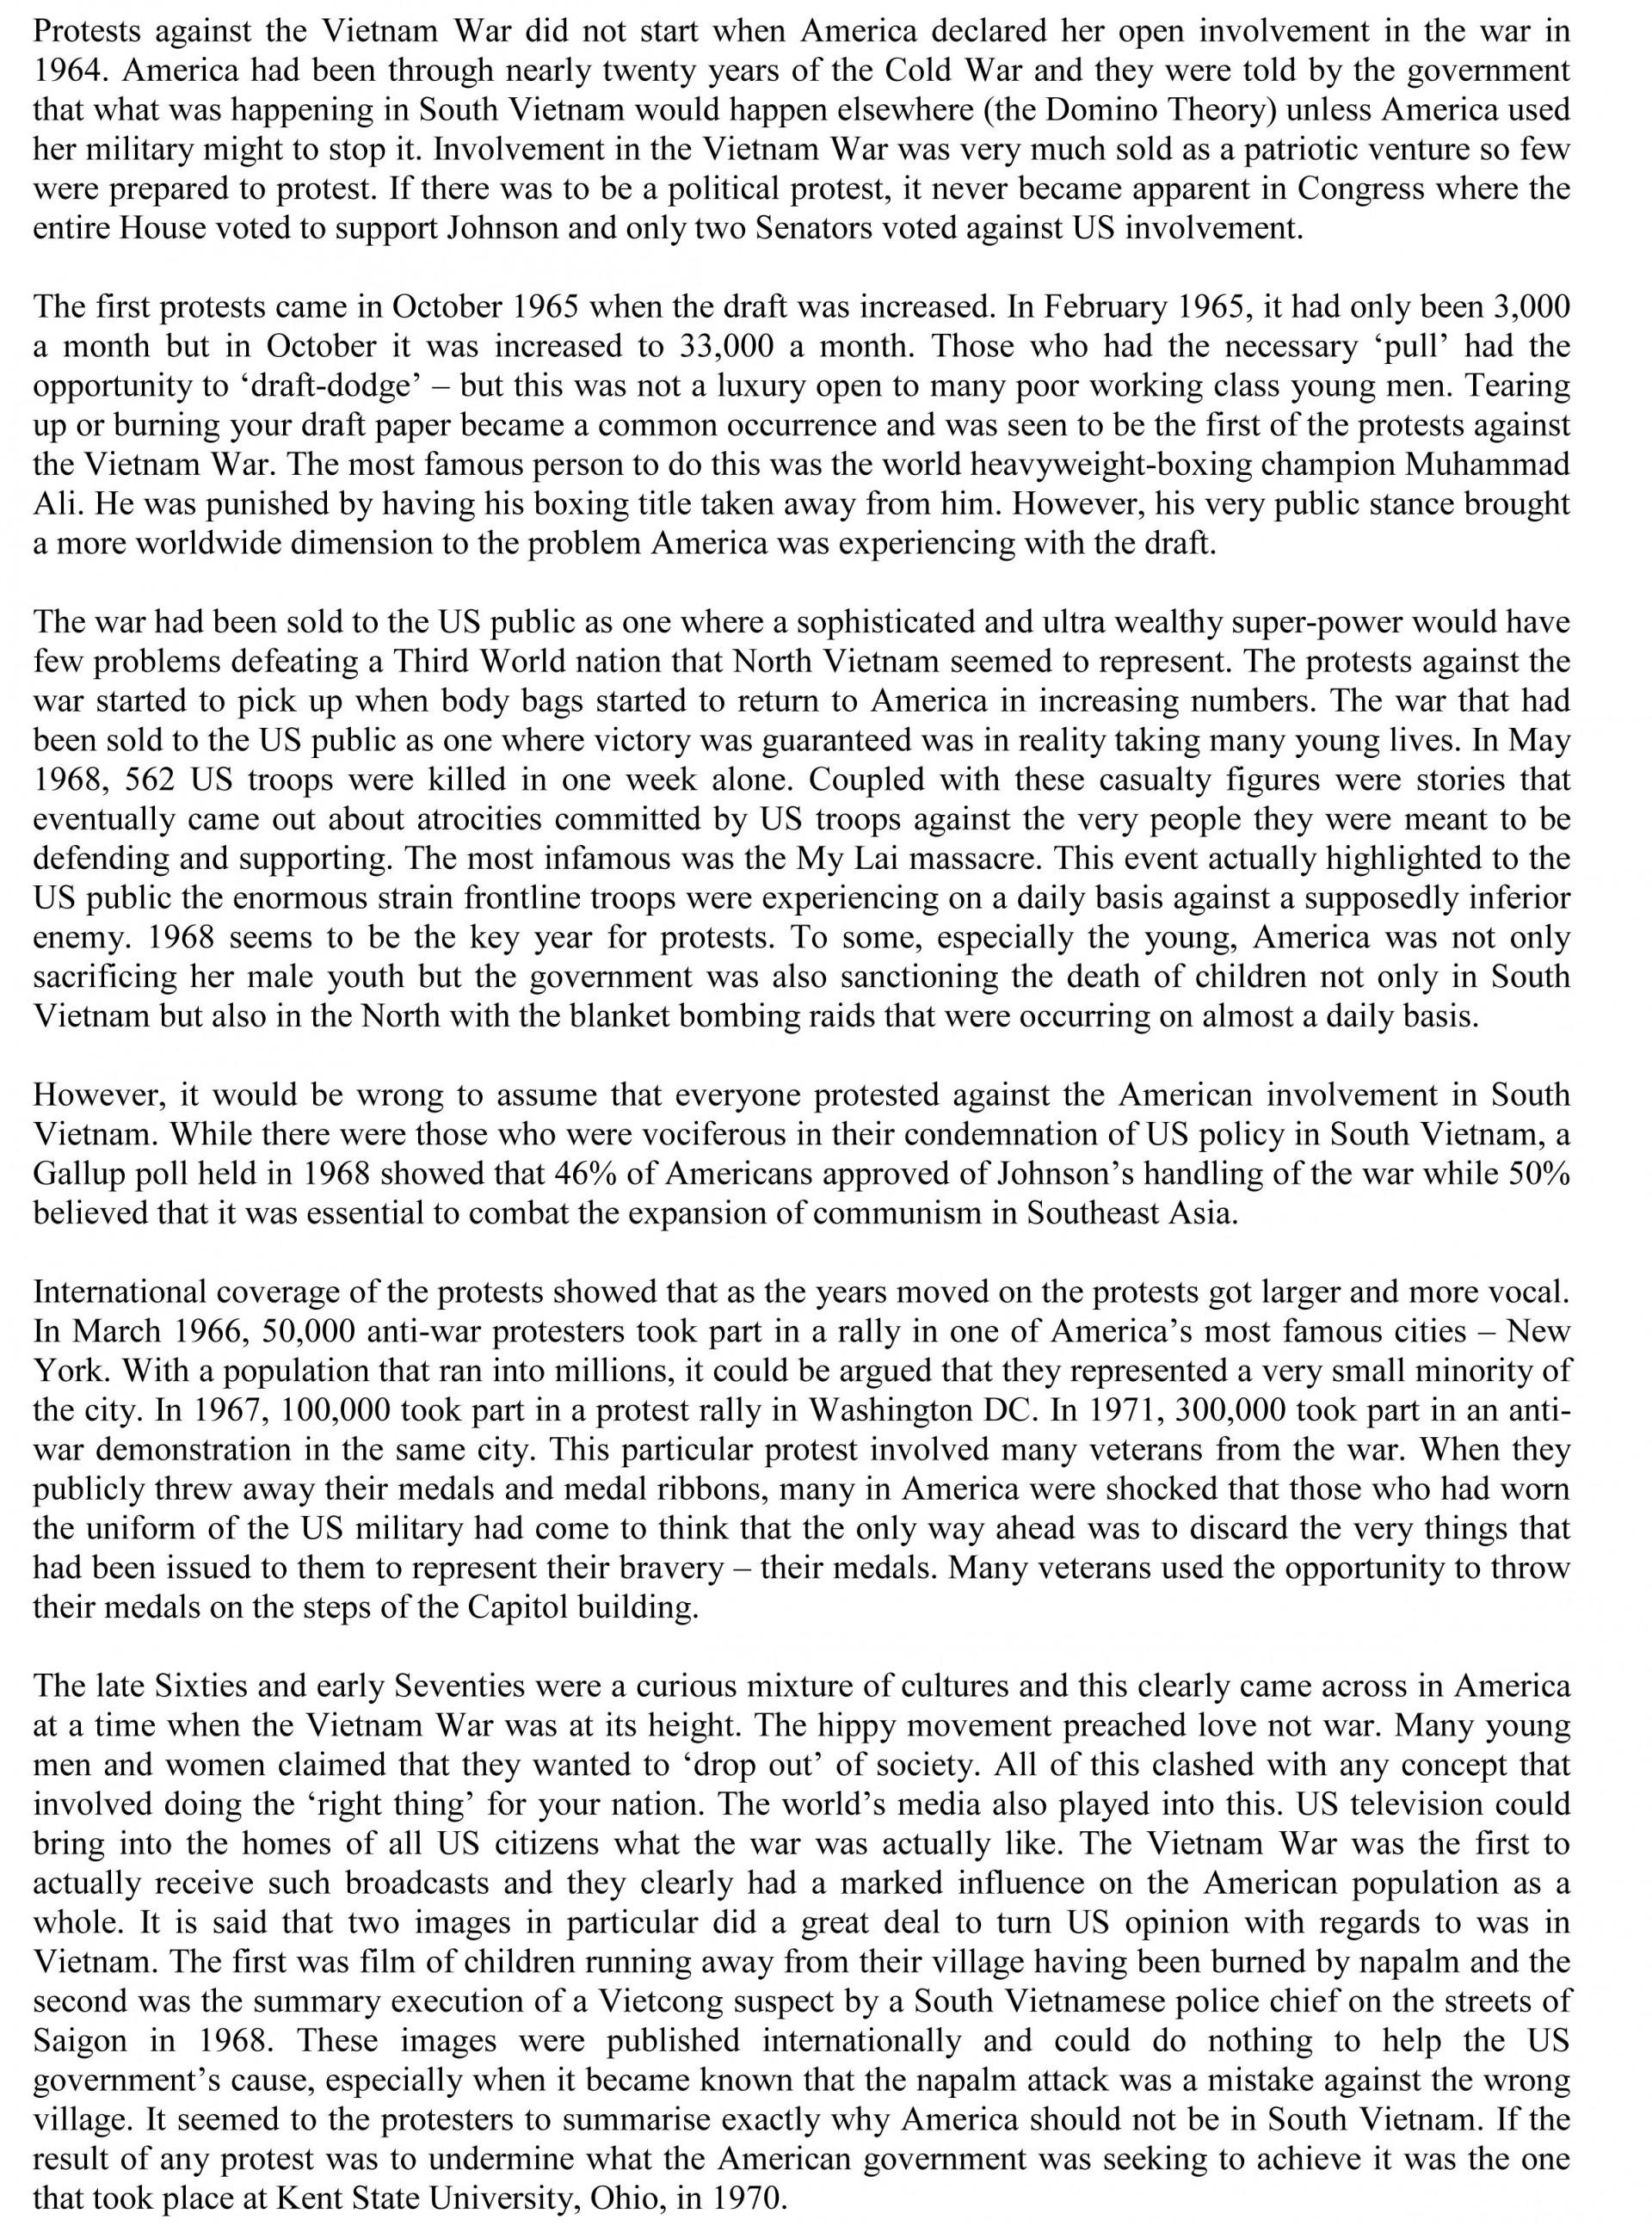 012 Essay Example Vietnam War Narrative Vs Wondrous Descriptive Studymode And Writing Igcse Ppt 1920